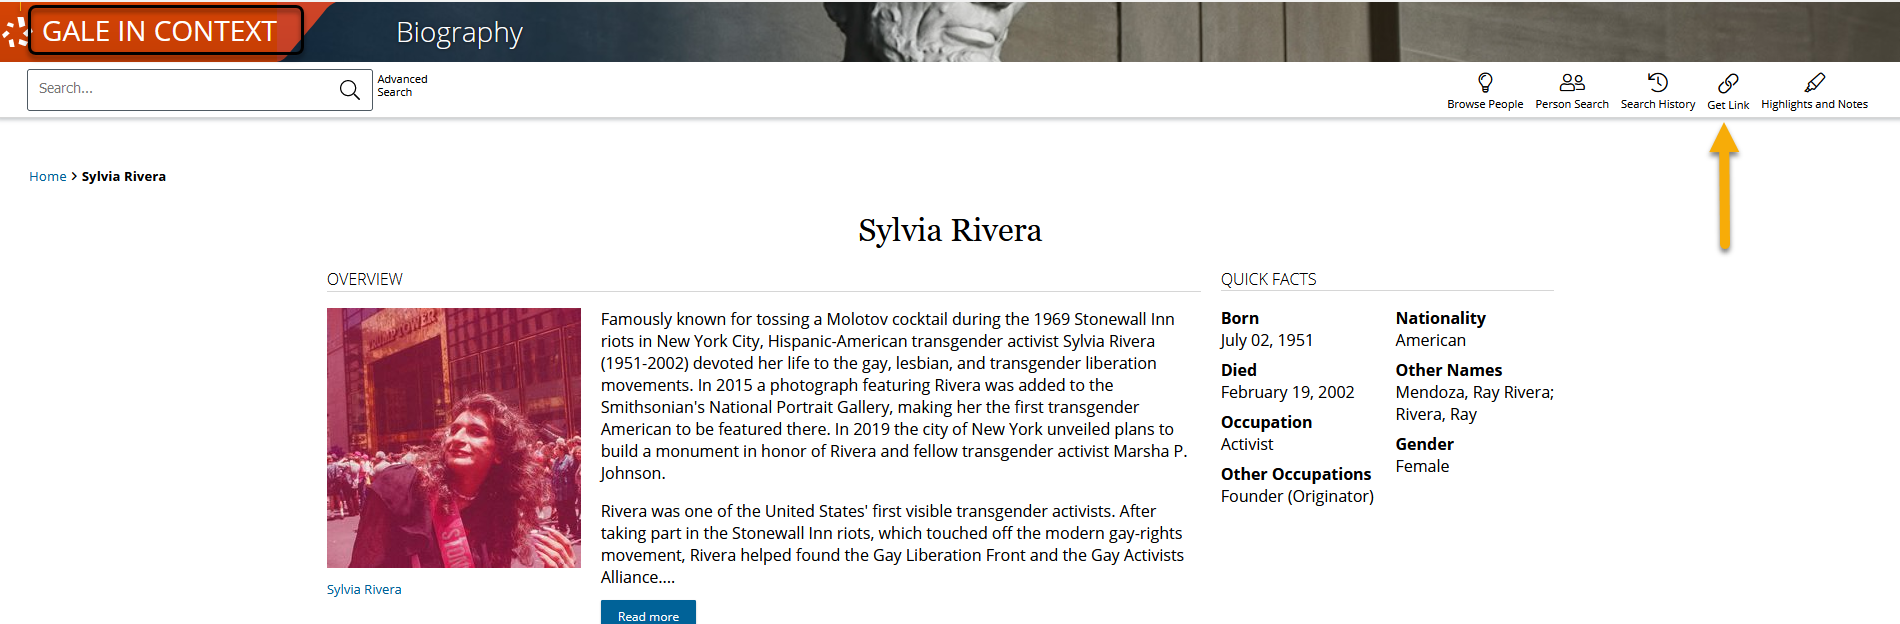 gale page on Sylvia Rivera, arrow to permalink ico